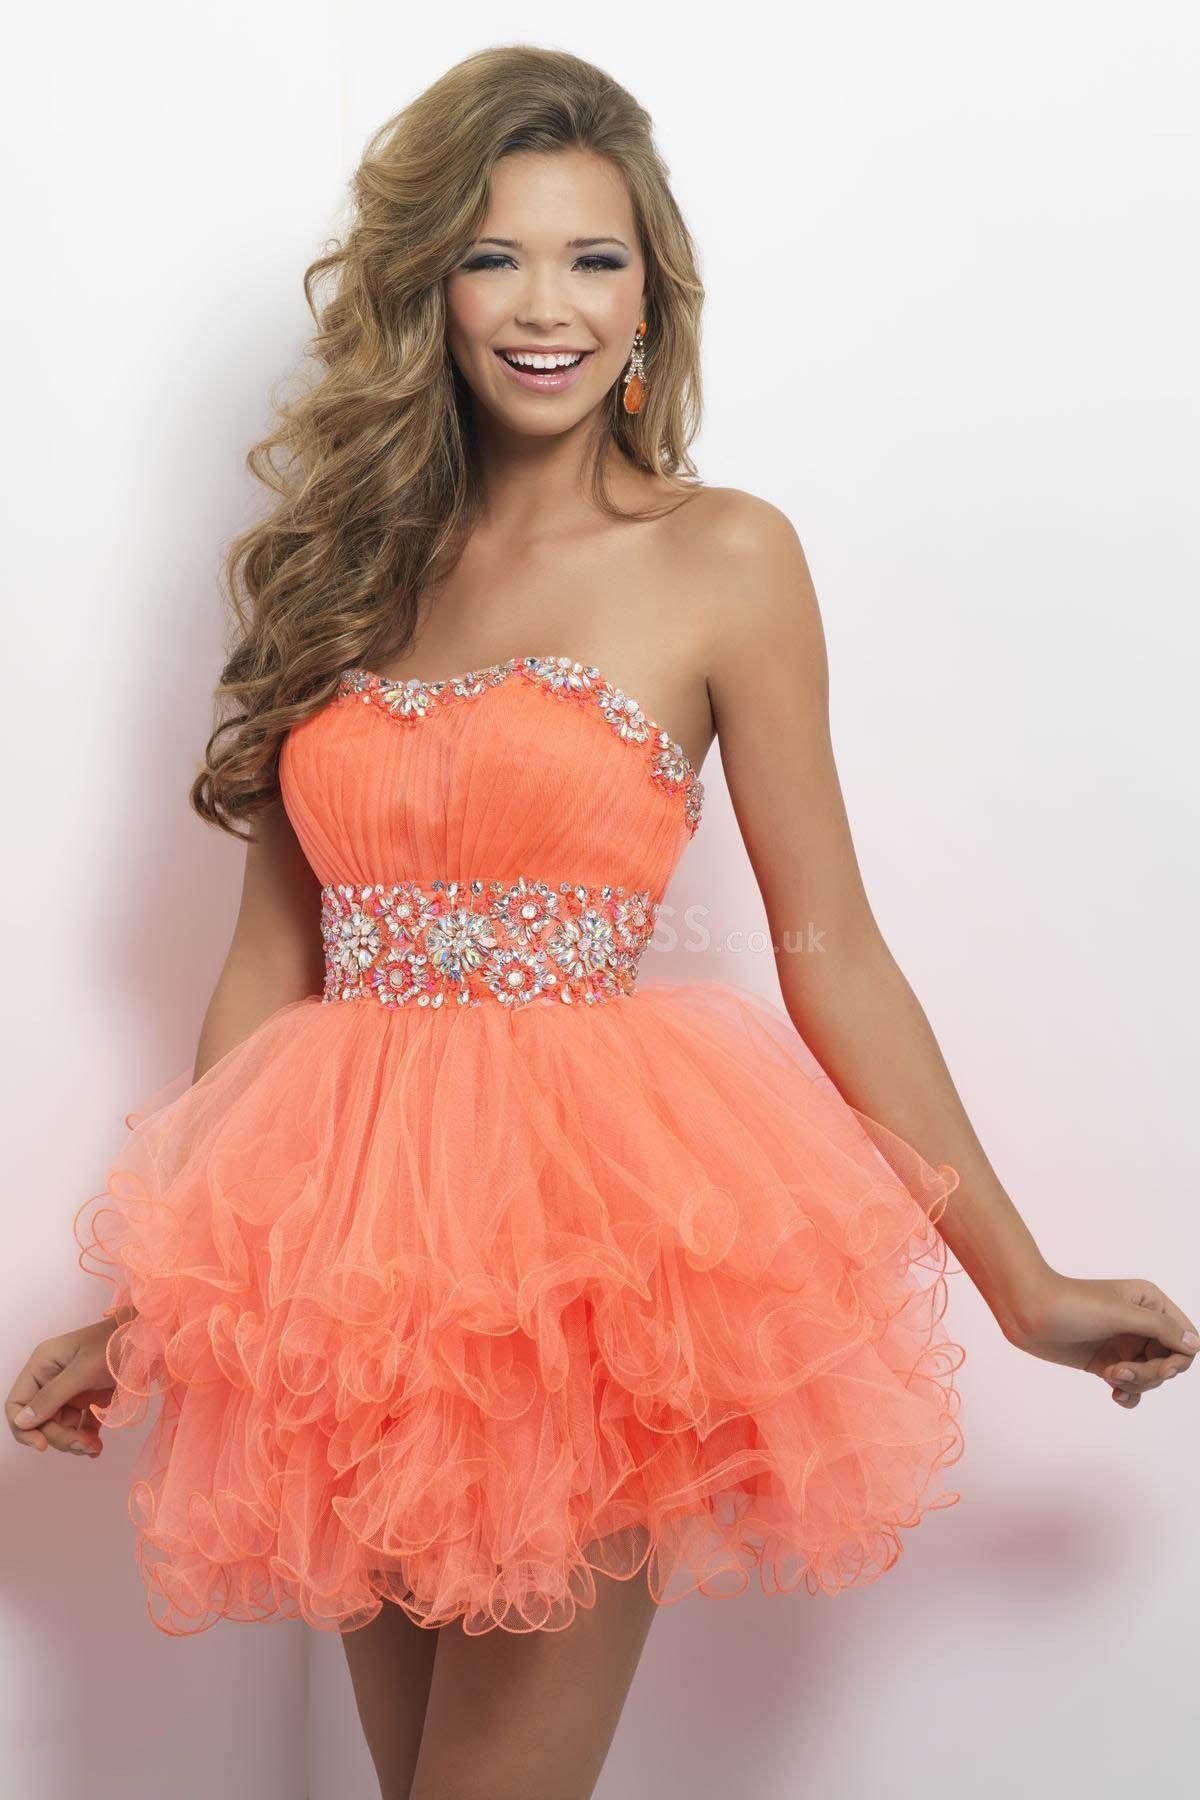 Baby Doll Prom Dress short prom dress orange prom dress My style